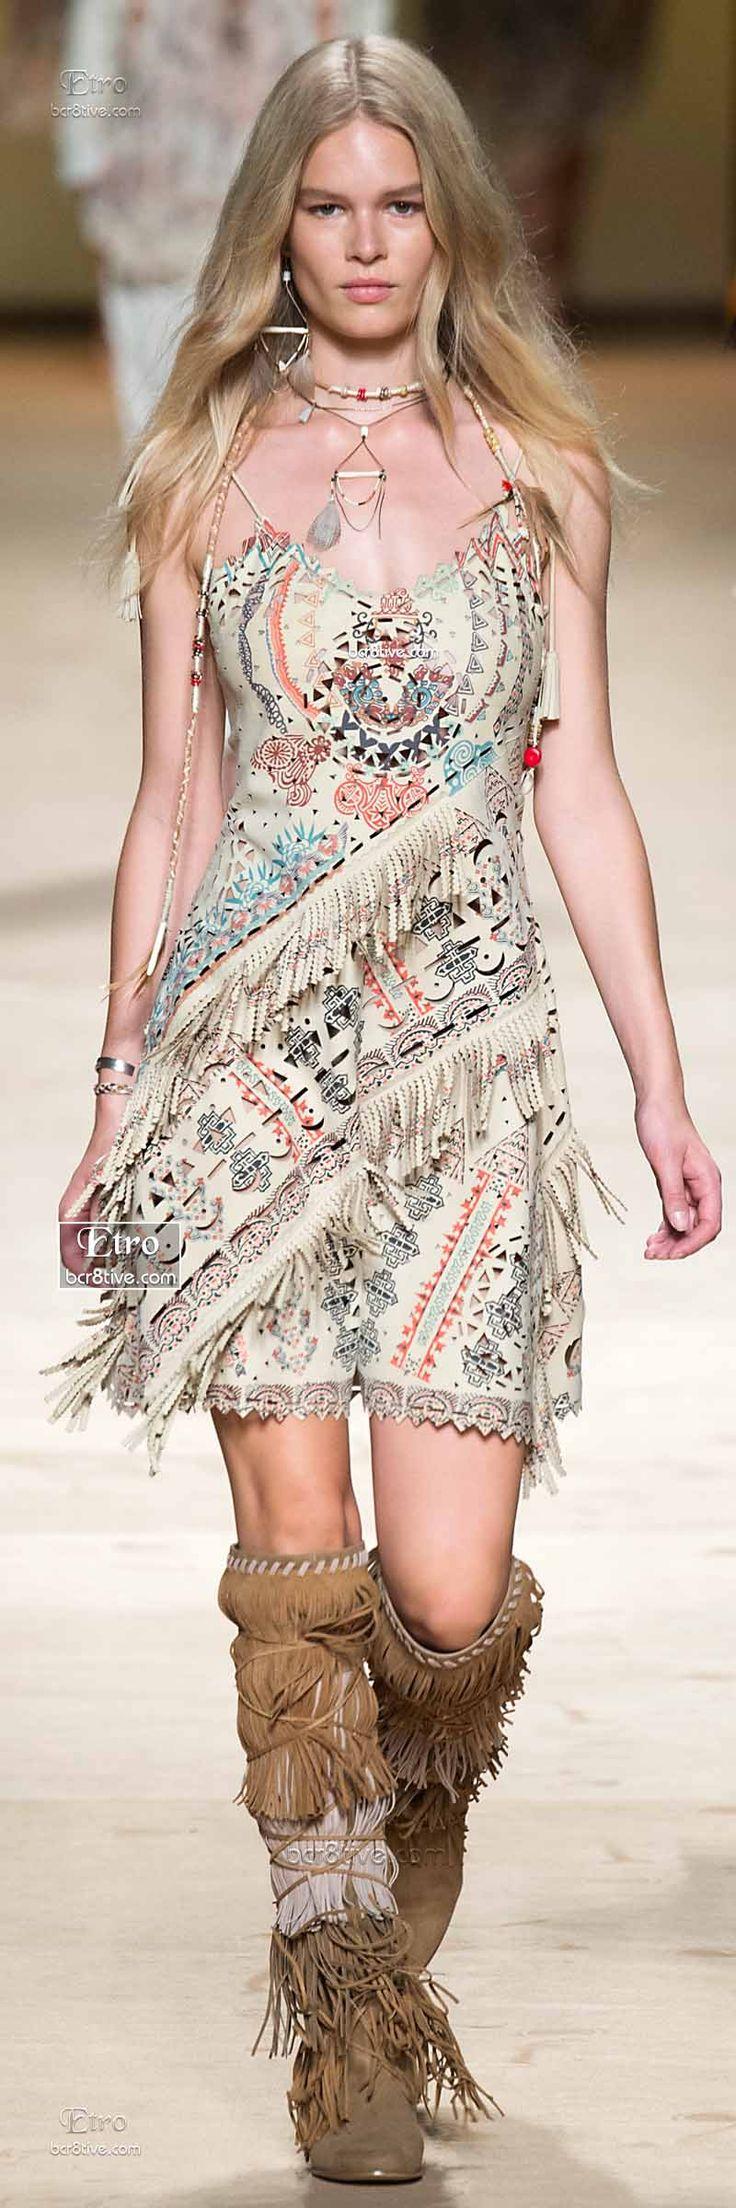 Native American Inspired Fringe Dress & Knee High Moccasins